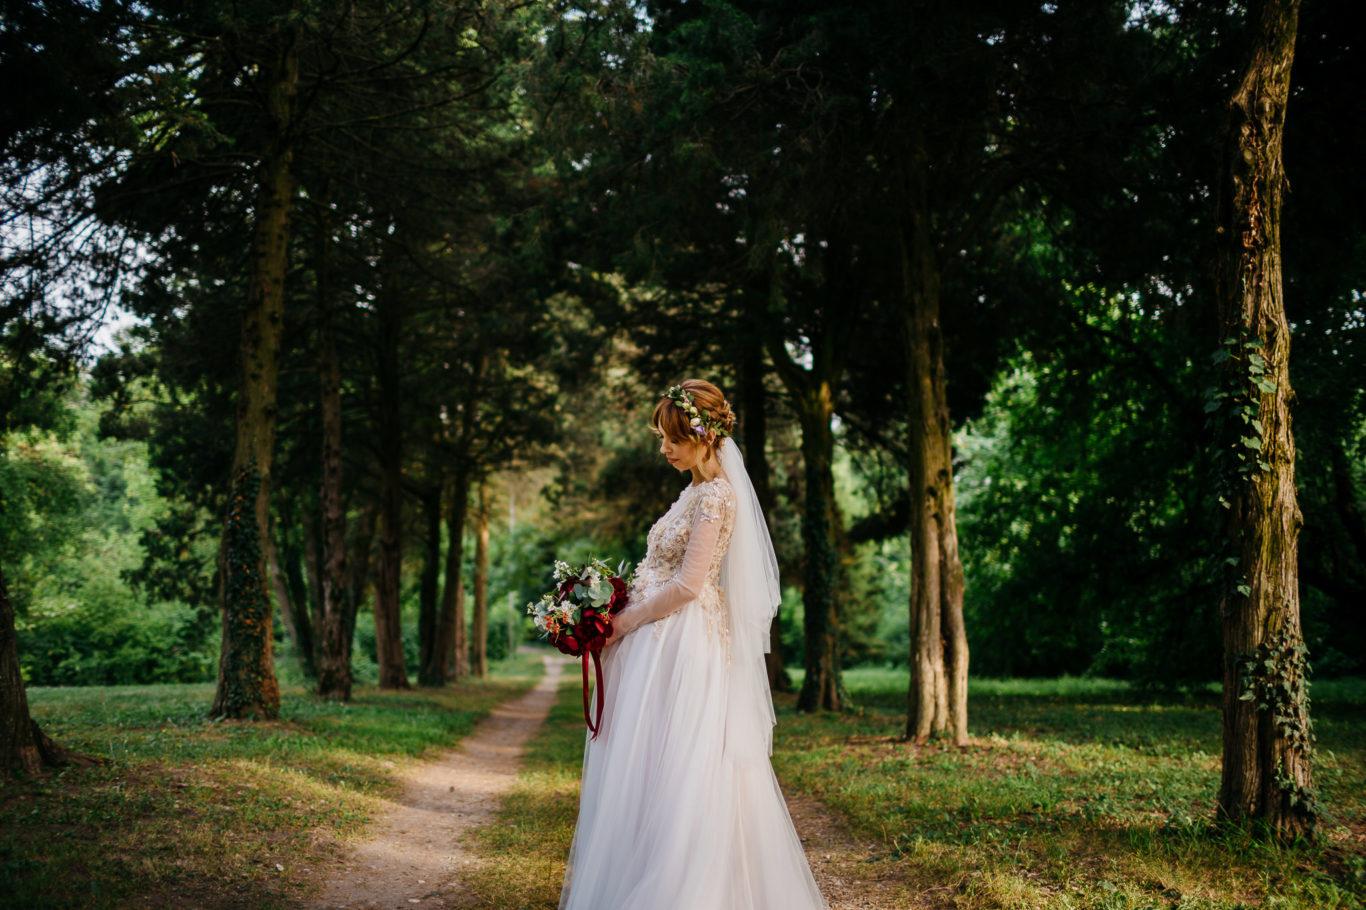 0243-Fotografie-nunta-Stirbey-Laura-Rares-fotograf-Ciprian-Dumitrescu-CDF_0309 (2)